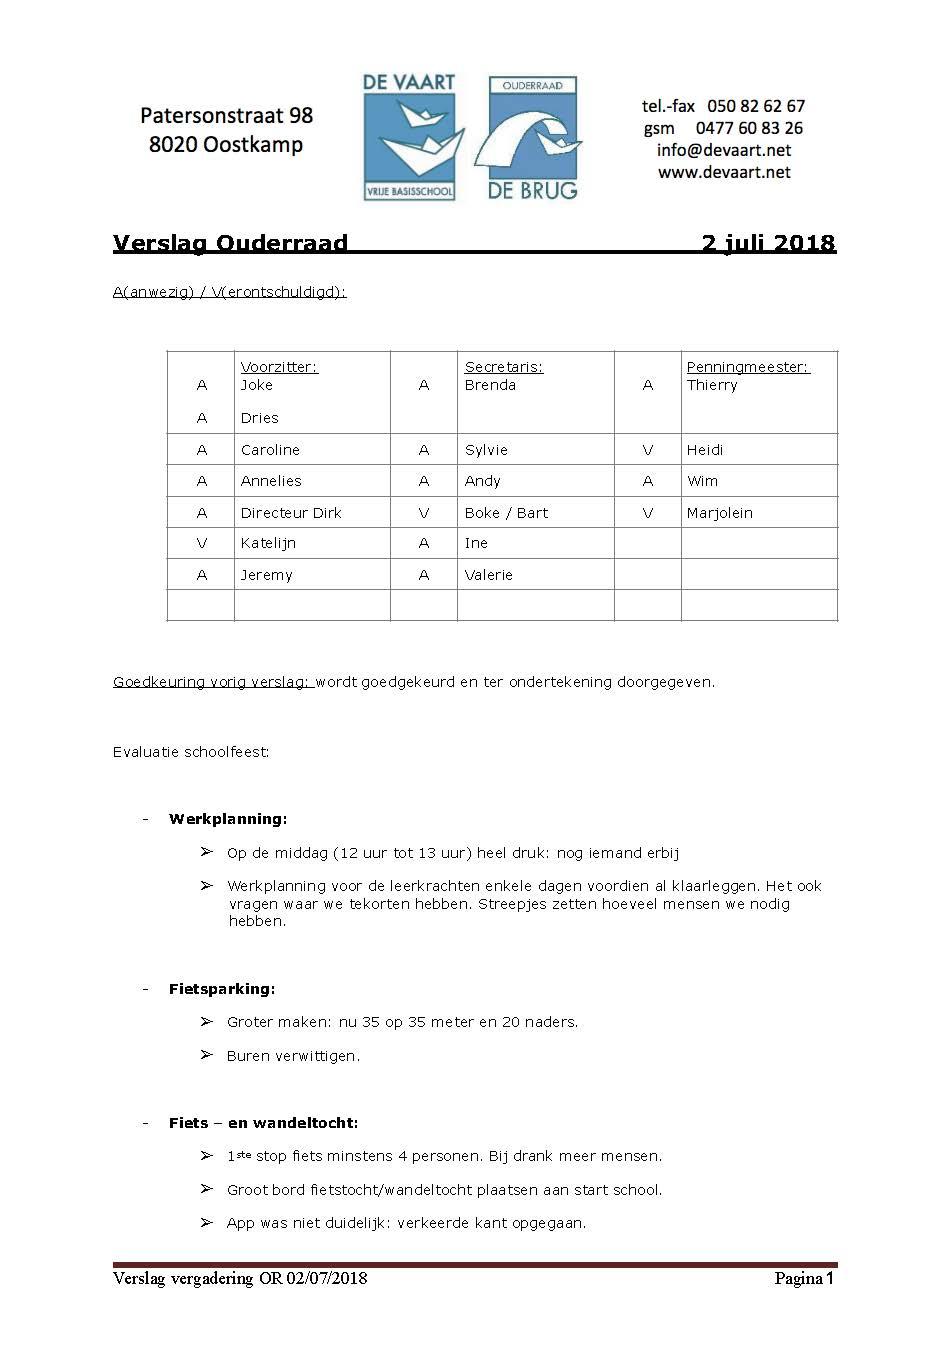 Verslag 2018 - 07 - 02 (evaluatieverslag)_Page_1.jpg